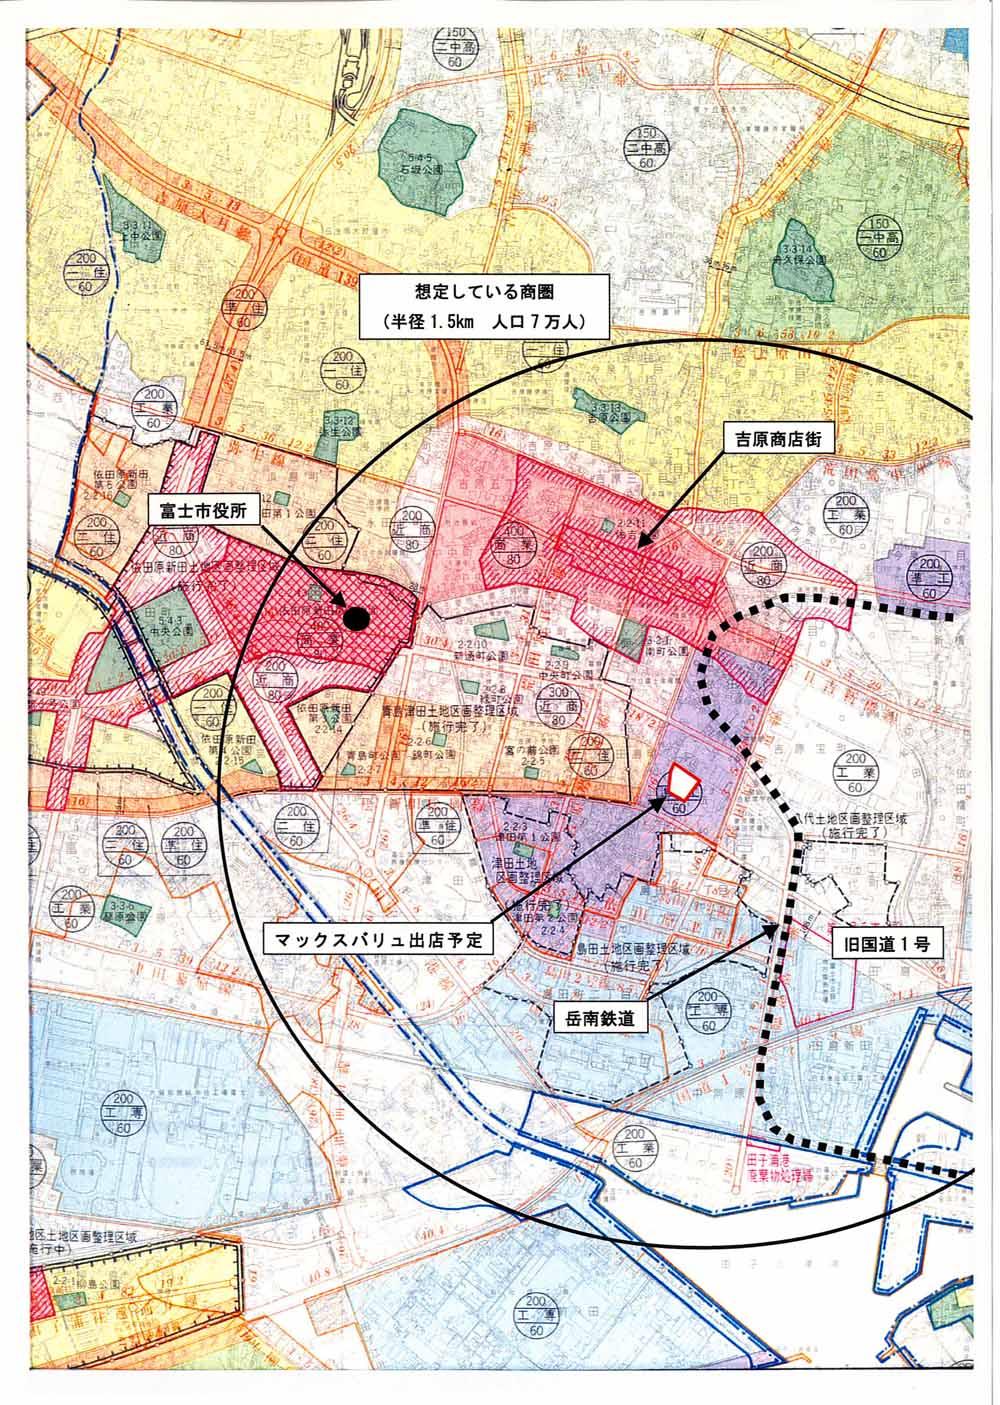 マックスバリュ富士荒田島店 出店説明会_f0141310_2213479.jpg